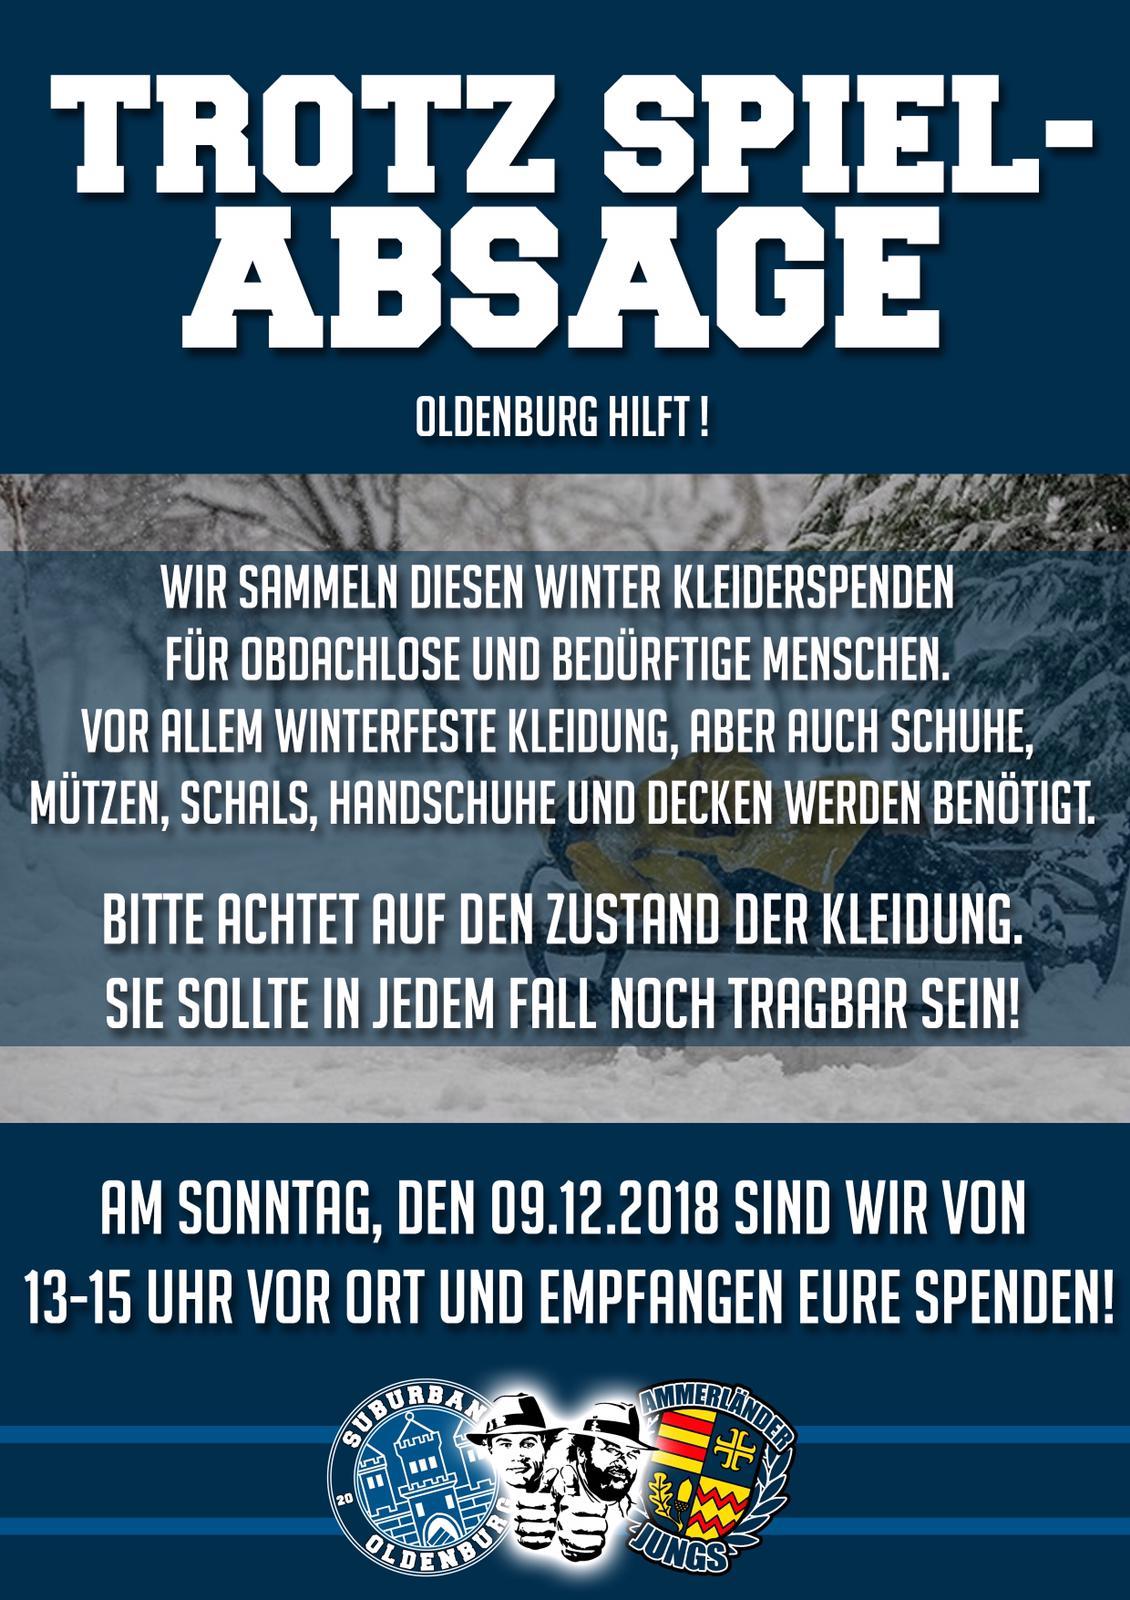 https://vfb-oldenburg.de/wp-content/uploads/7772d780-85eb-4266-bb83-08e875577c9b.jpg